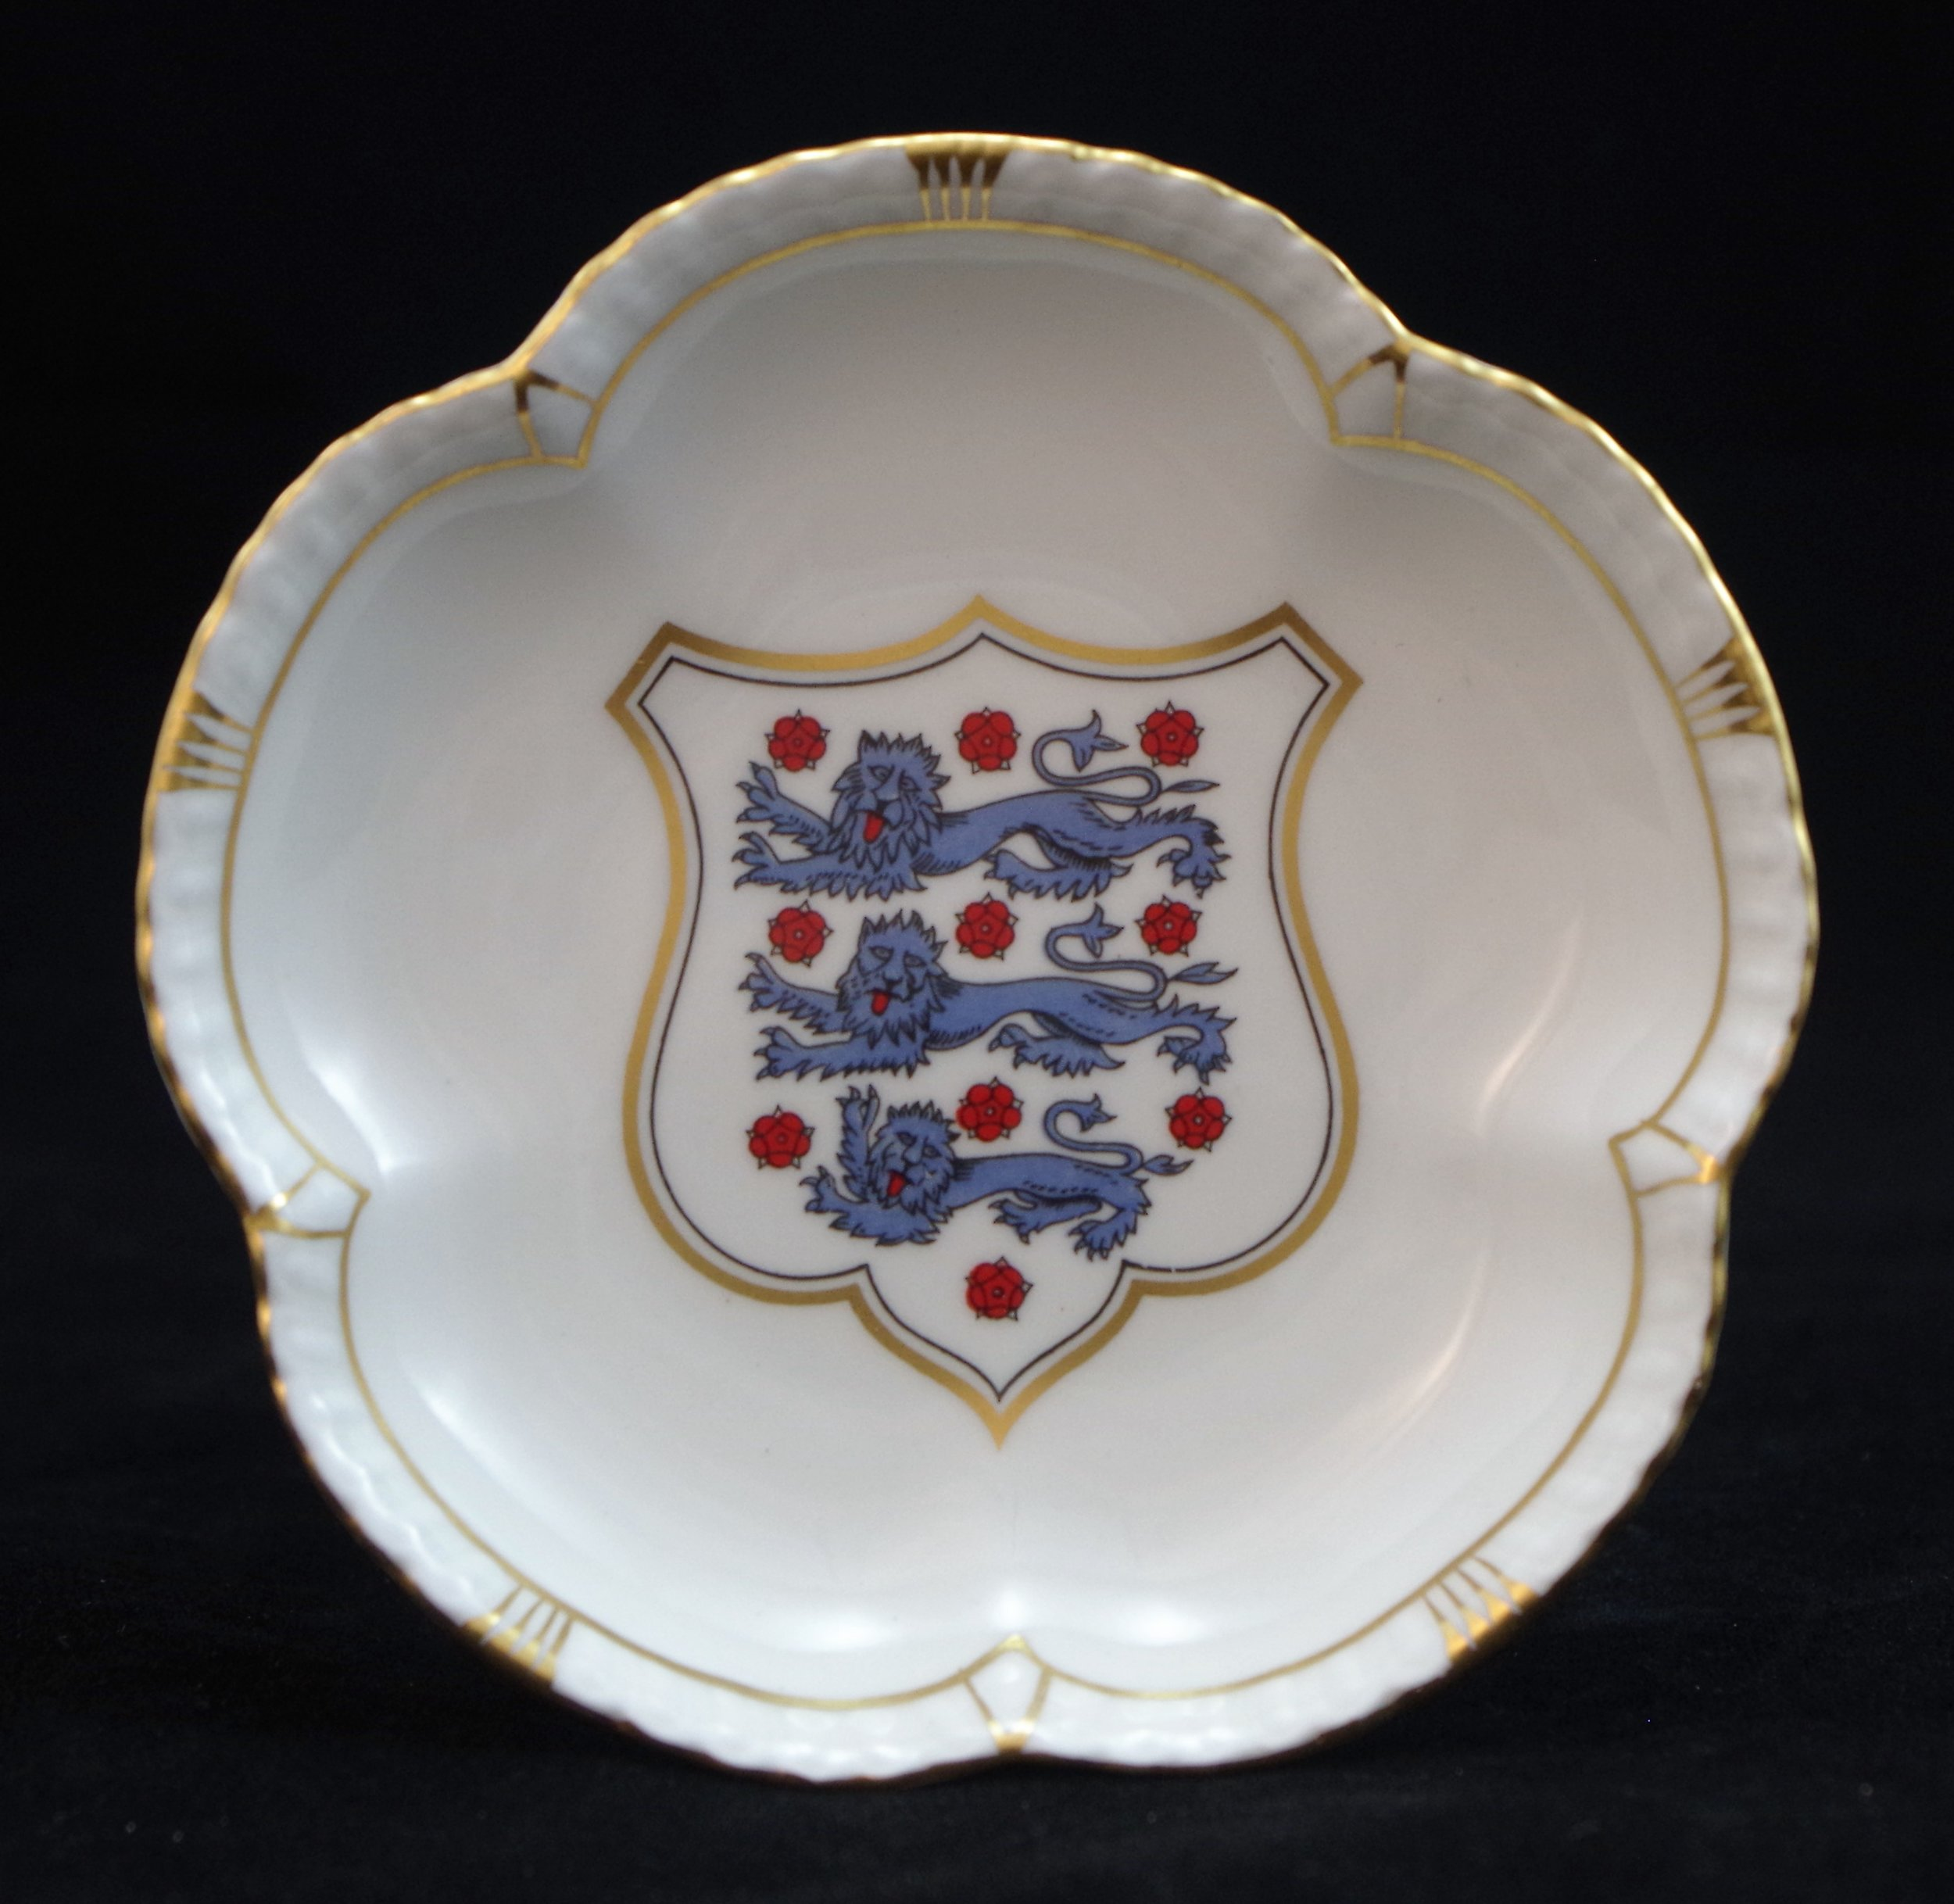 royal-crown-derby-tudor-rose-tray-jack-burkett-10th-november-1958